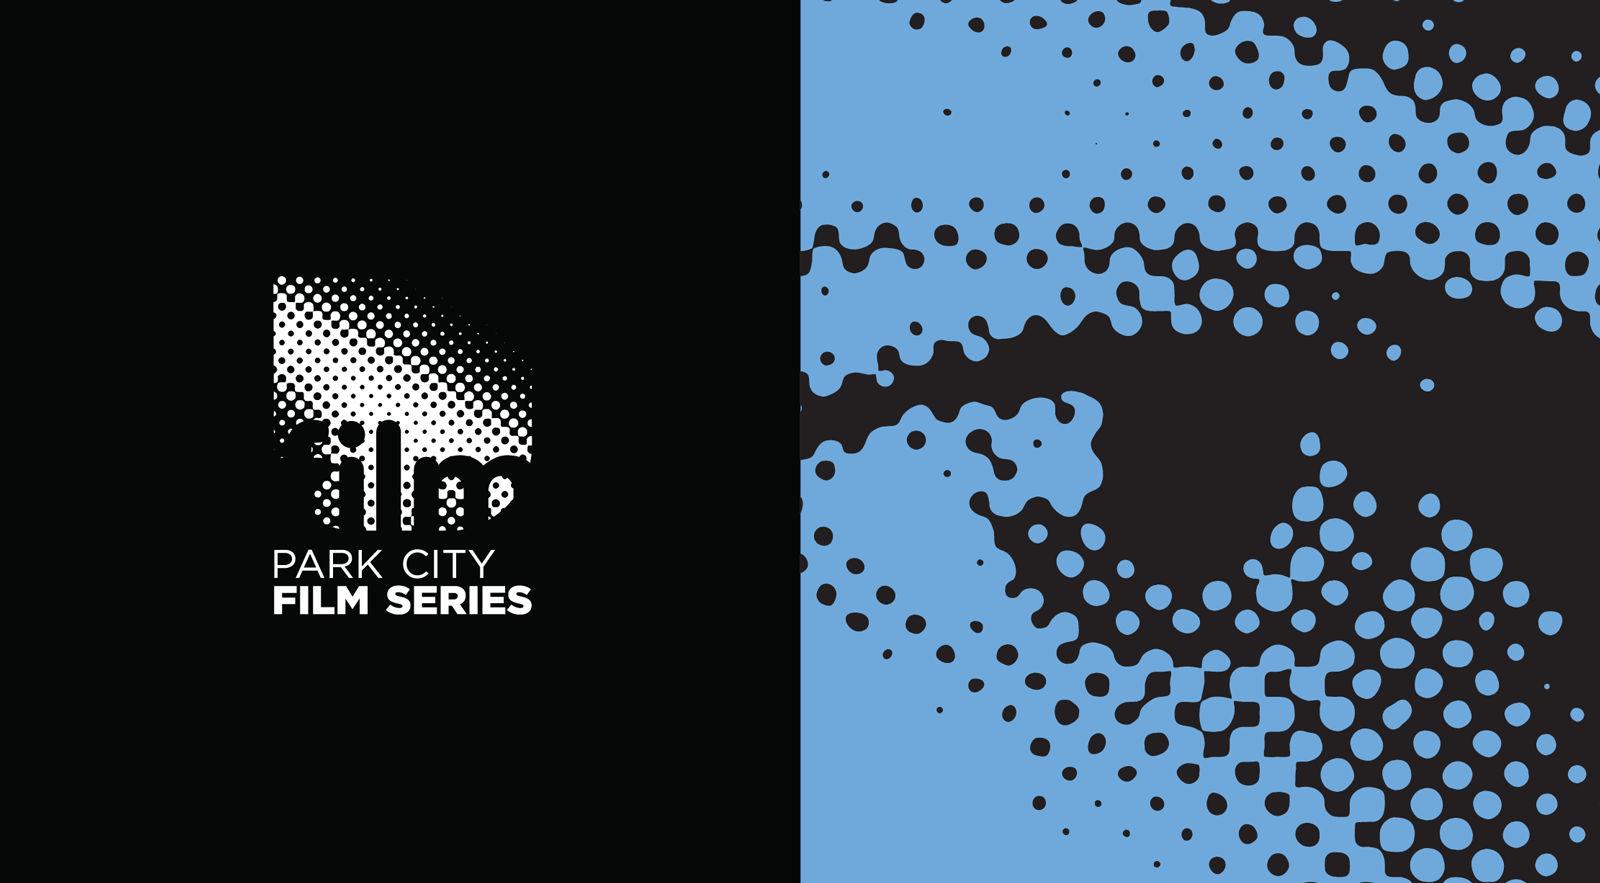 park-city-film-series-white-logo.png